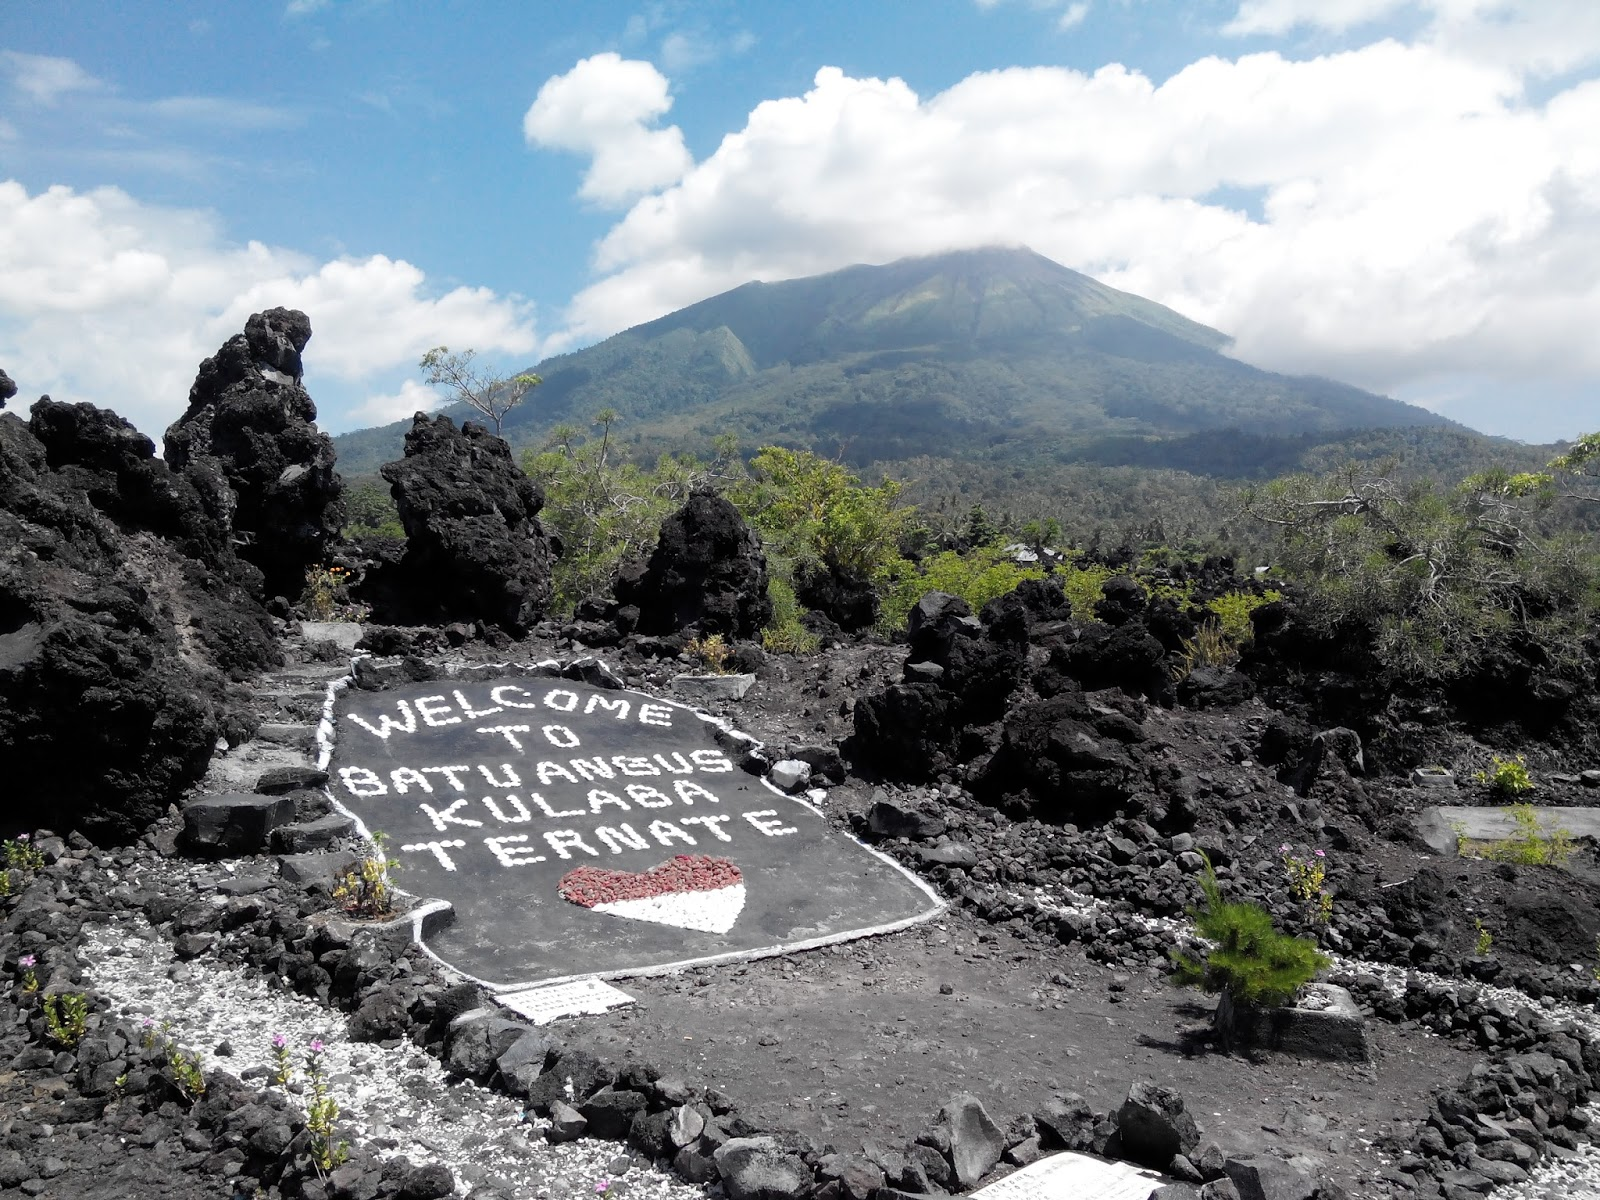 Indonesia Tourism Batu Angus Stone Ternate Top Attraction Kota